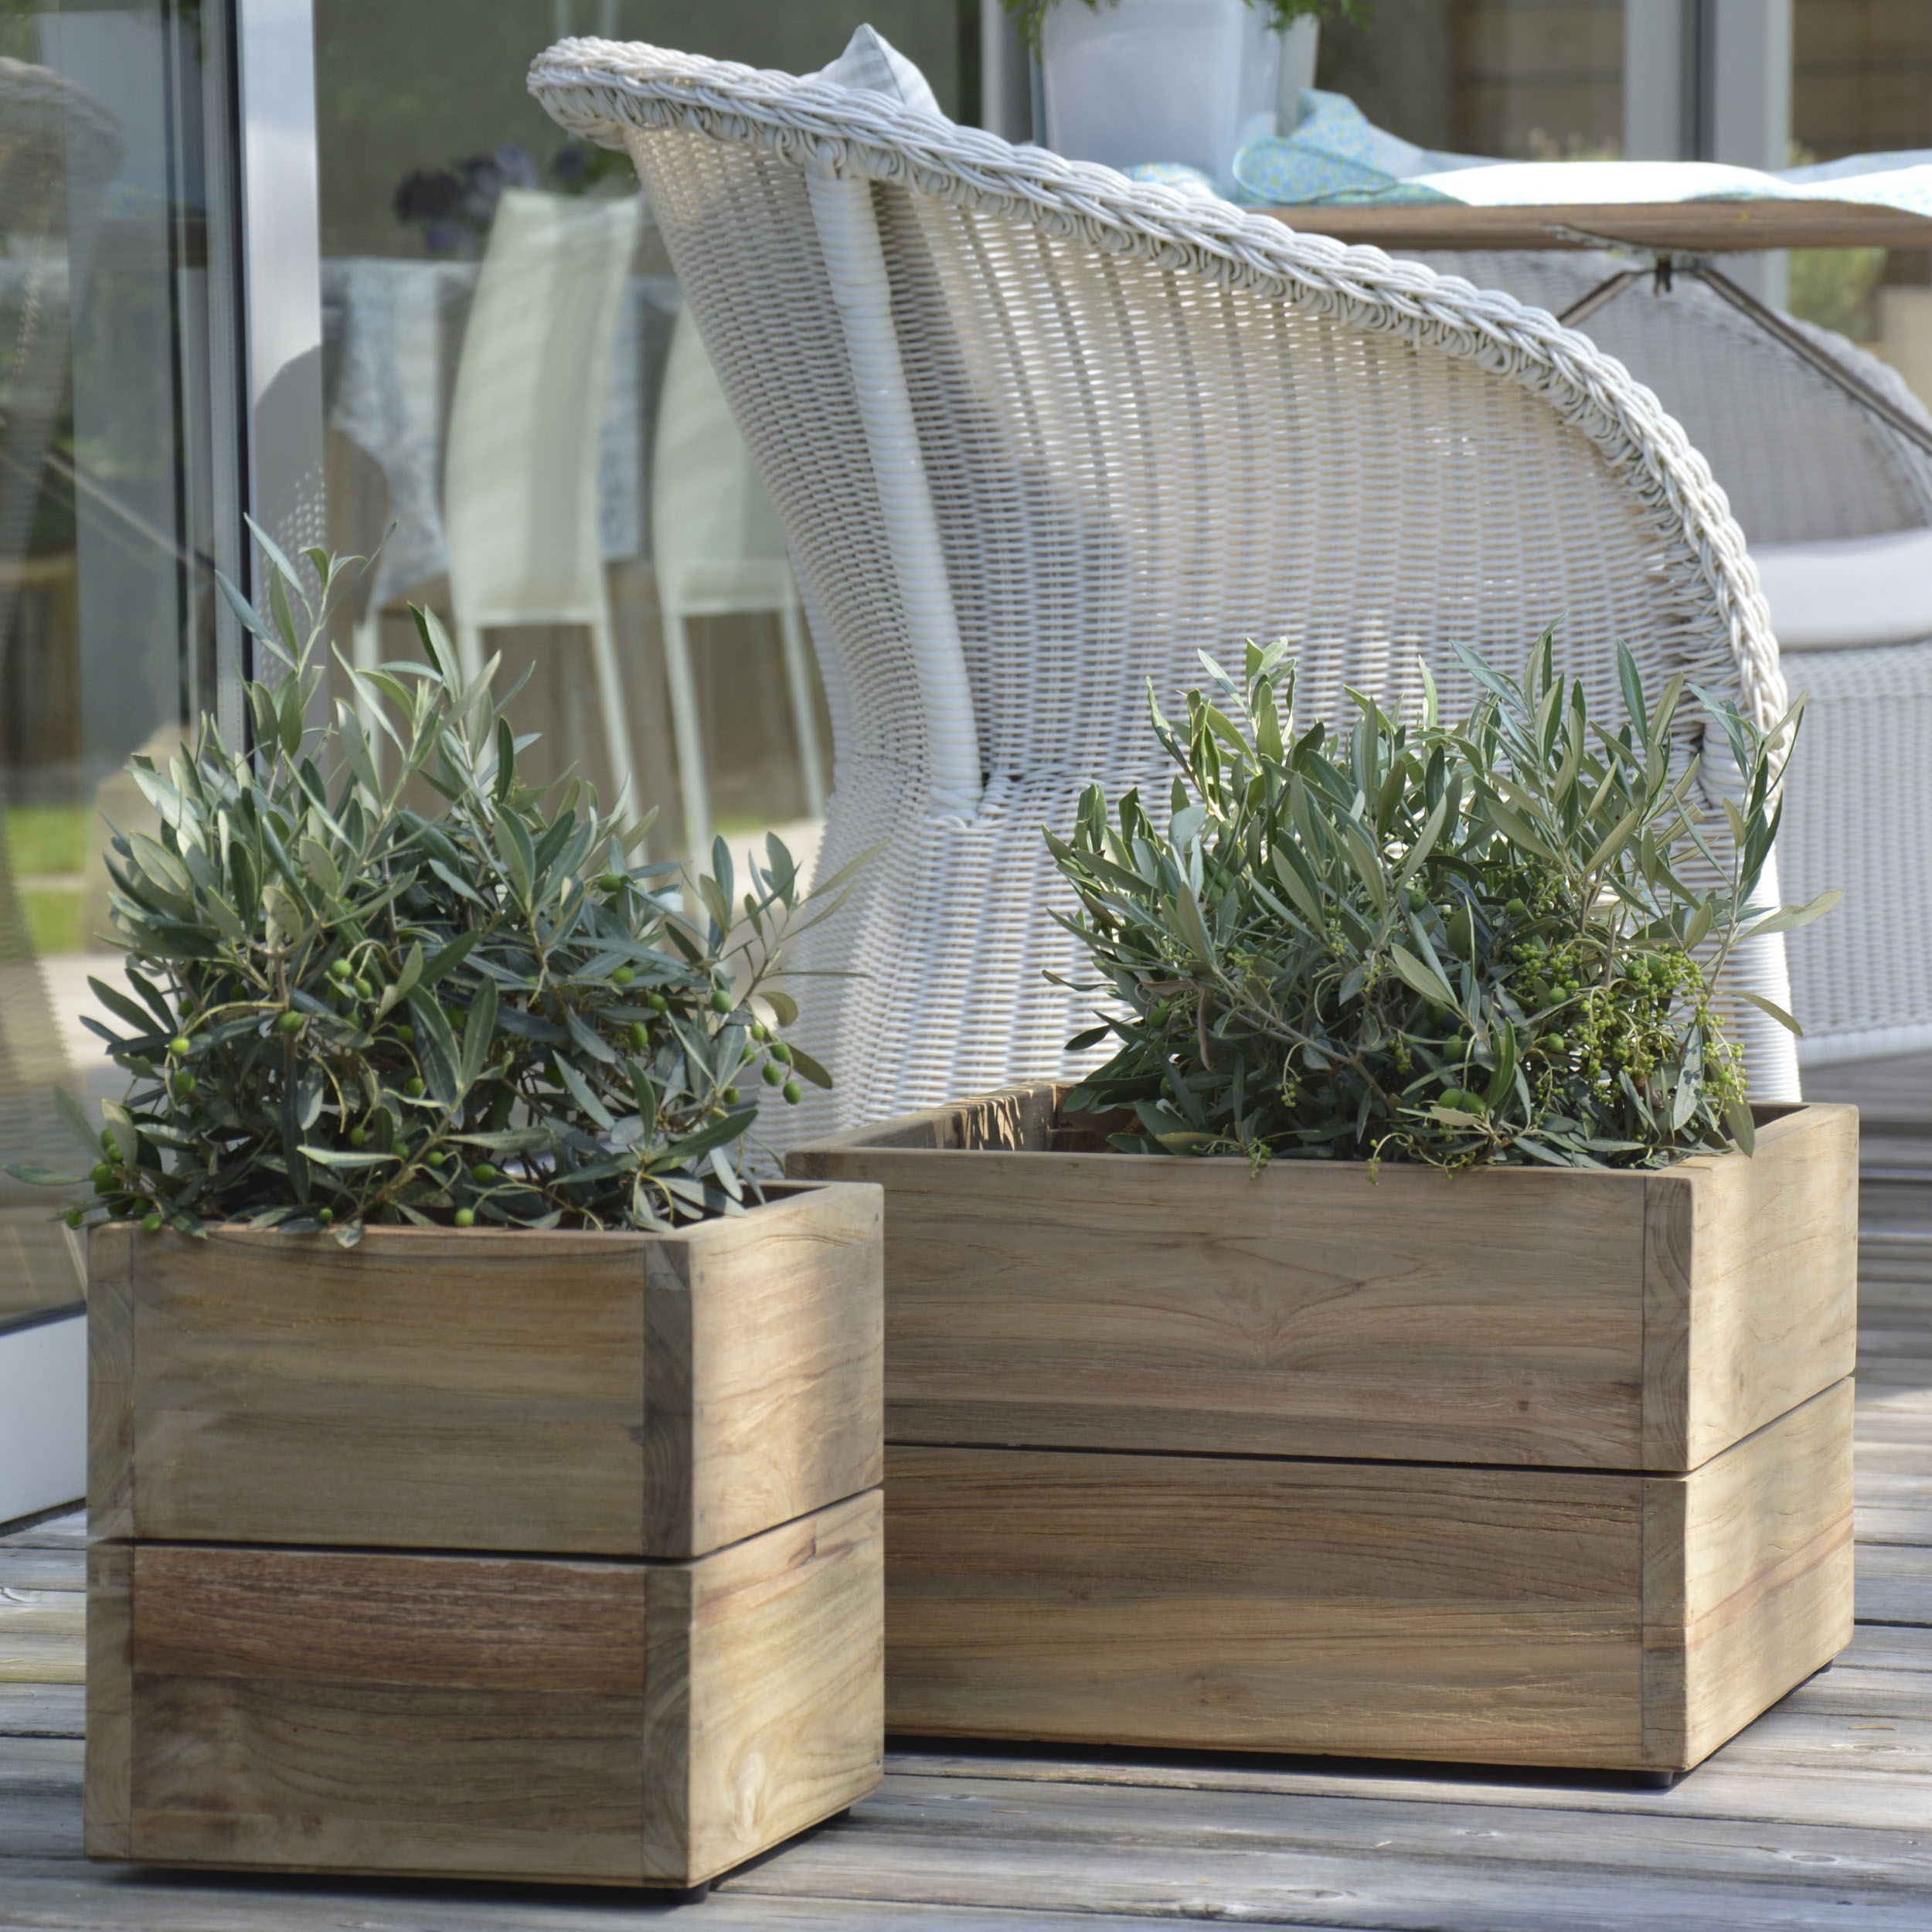 Minigarden Pflanzbehälter